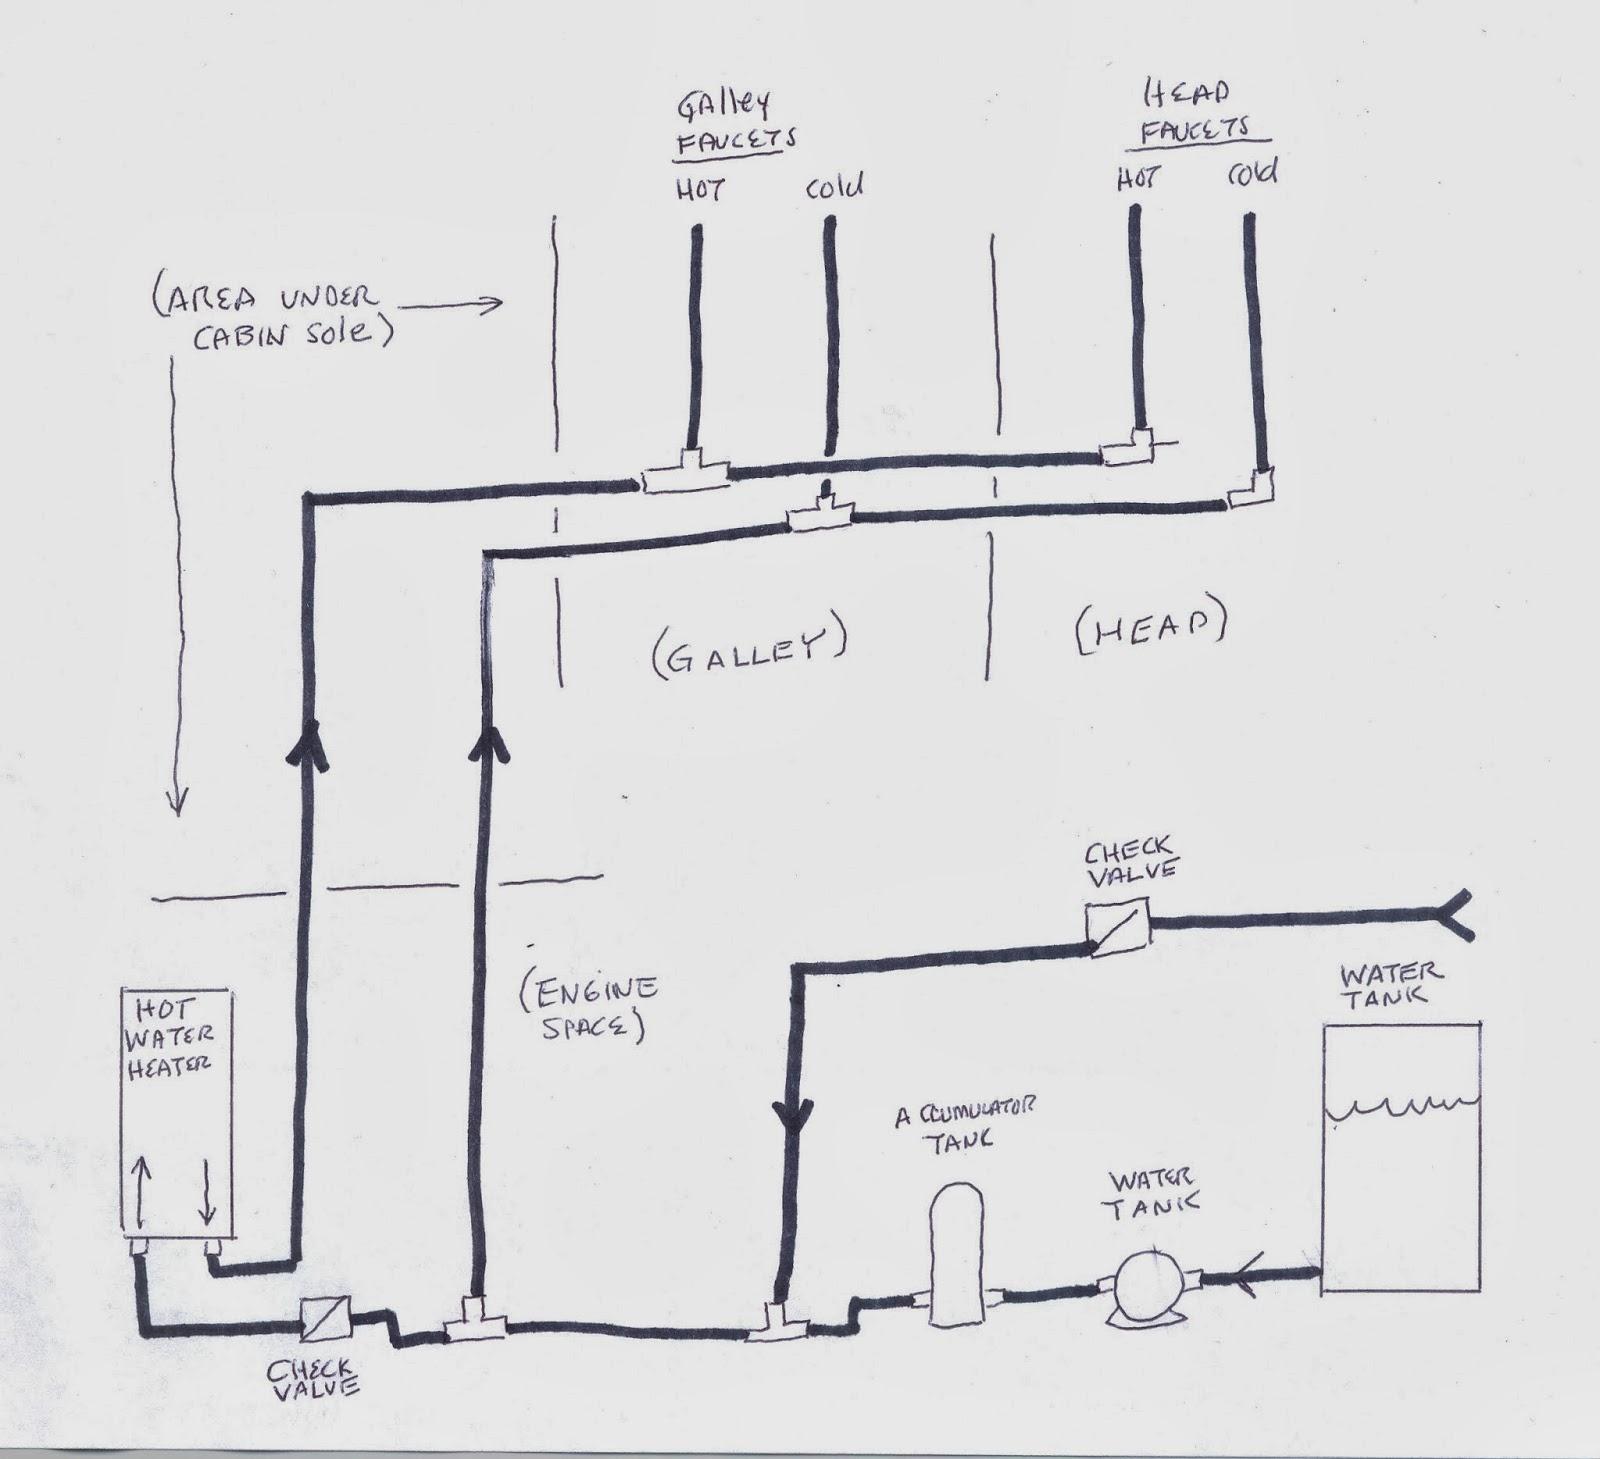 Plumbing Schematic Diagram   Licensed HVAC and Plumbing on